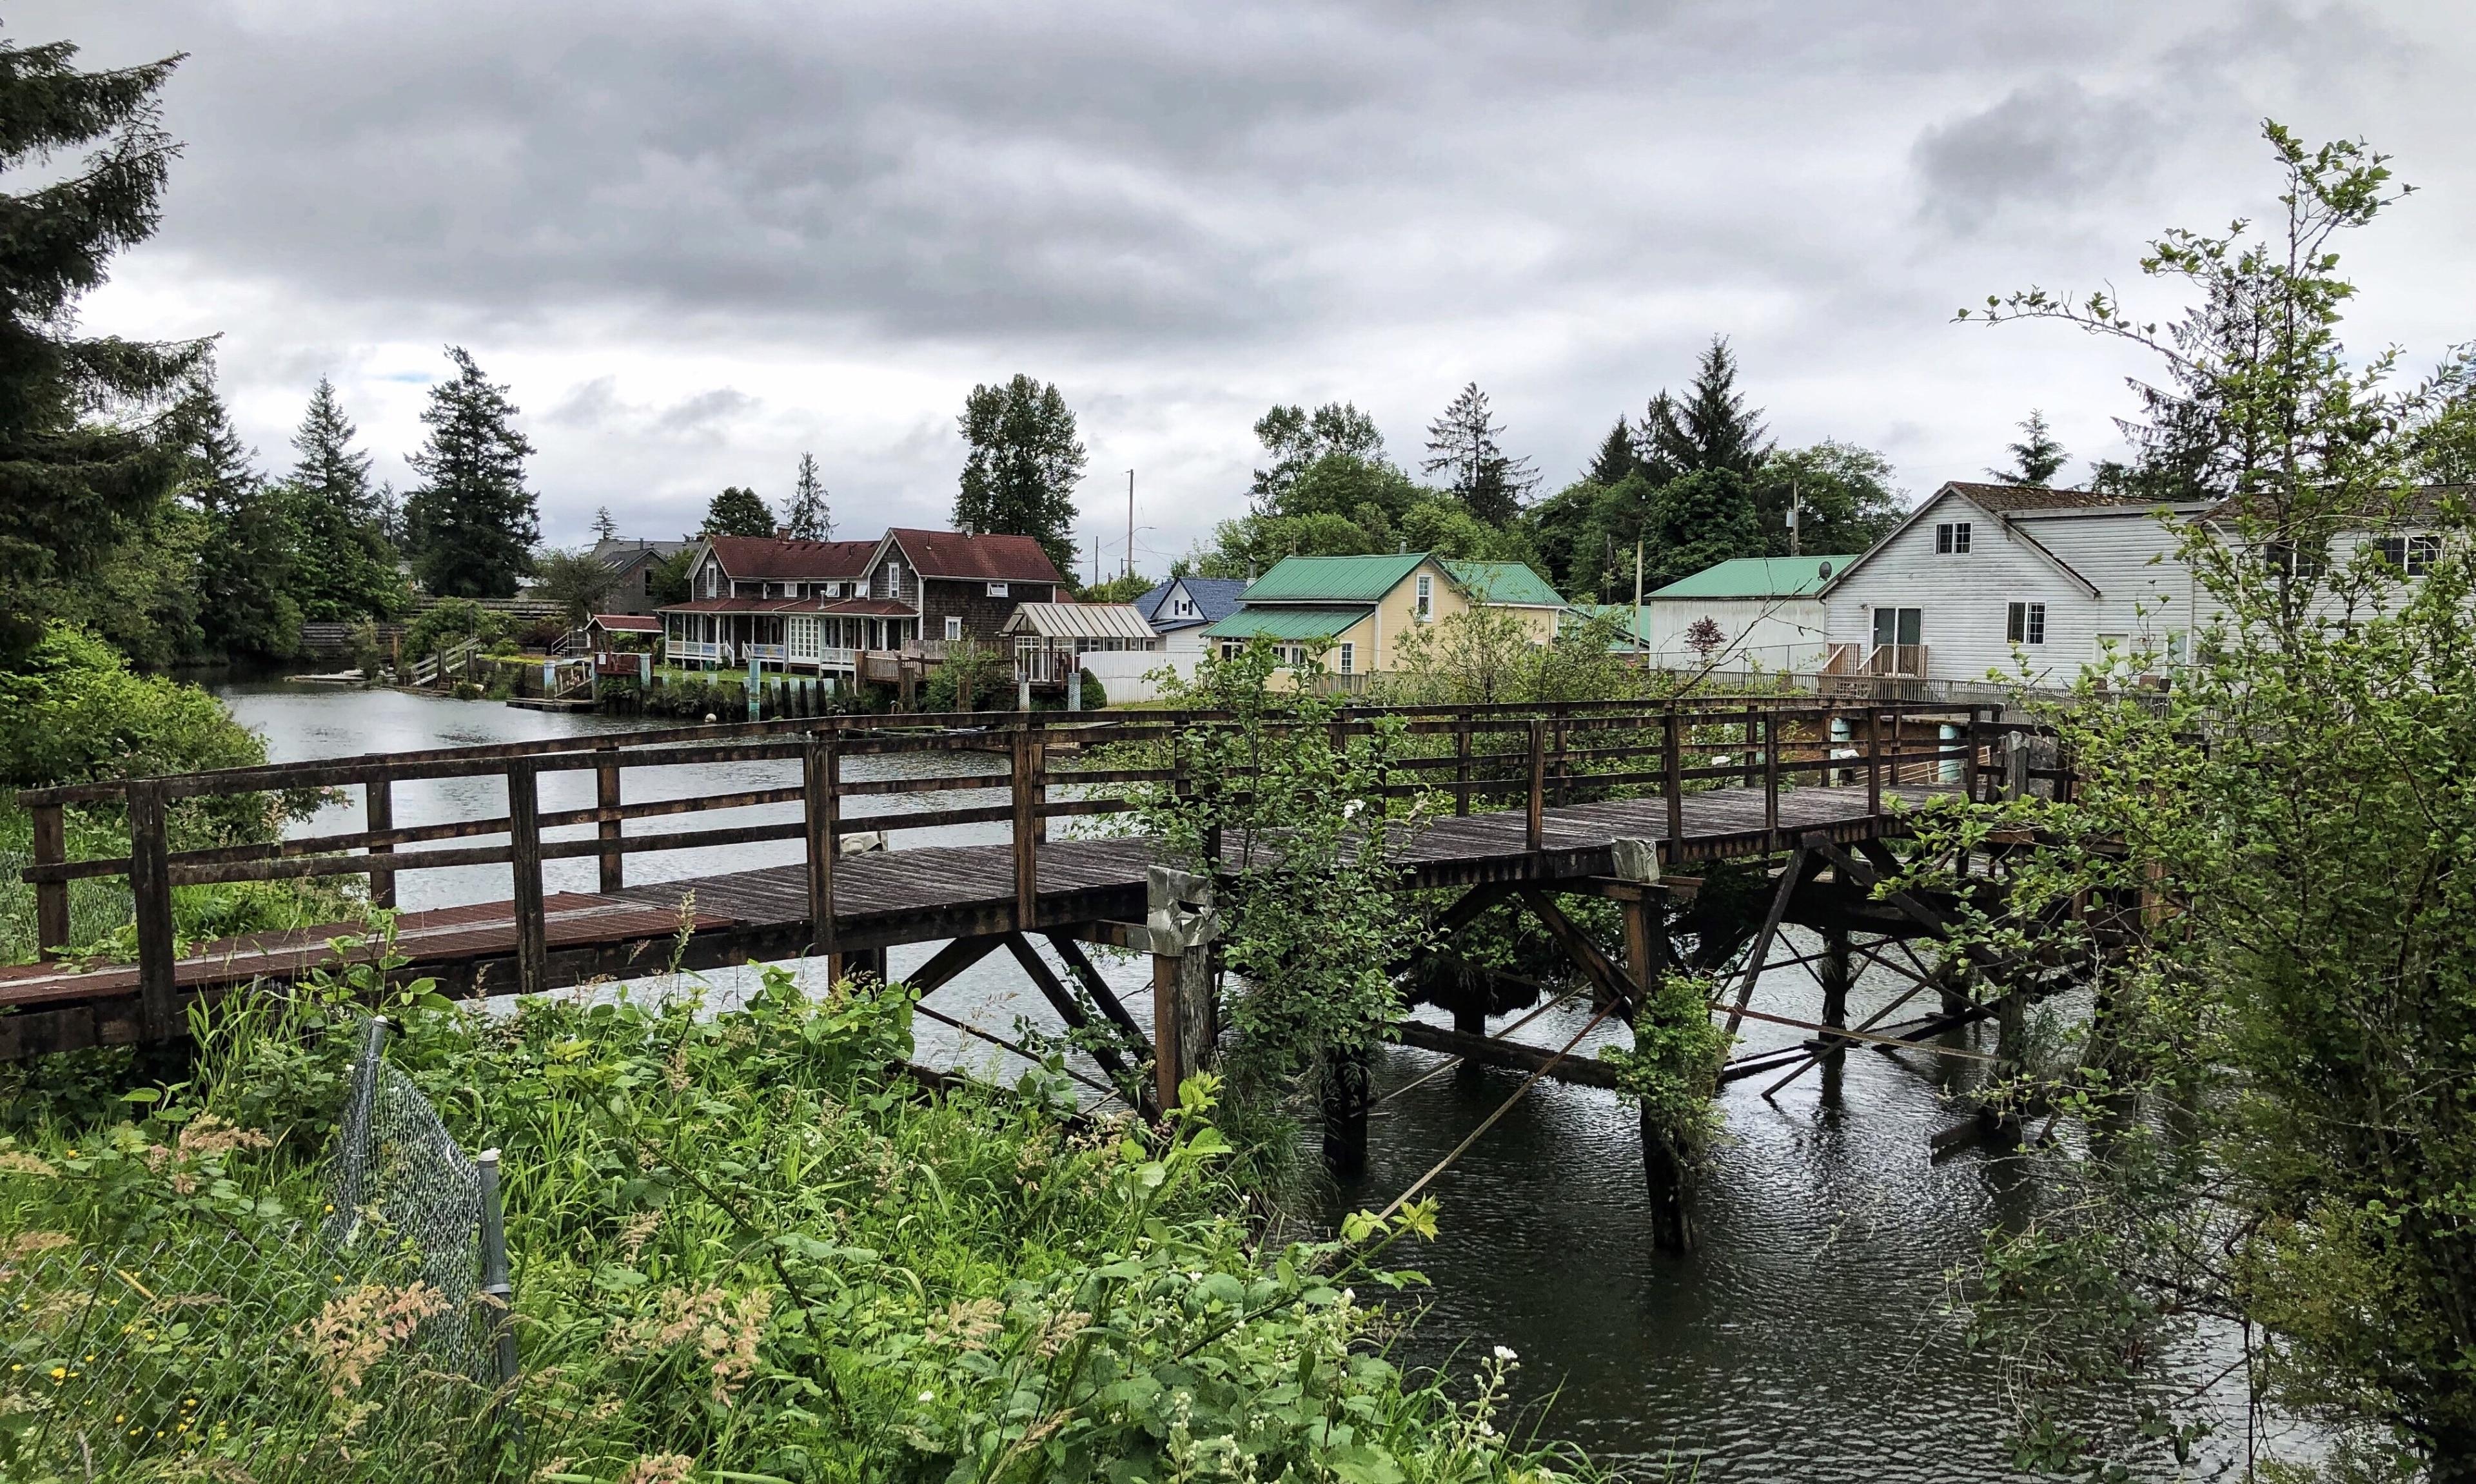 Wahkiakum County, Washington, United States of America